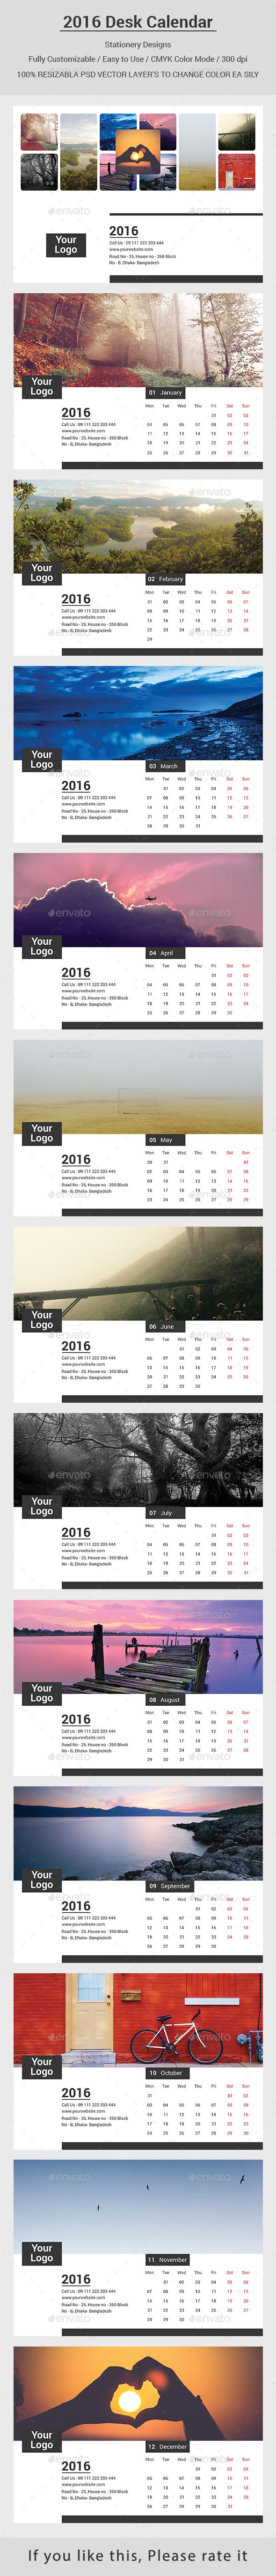 2016 Desk Calendar Design